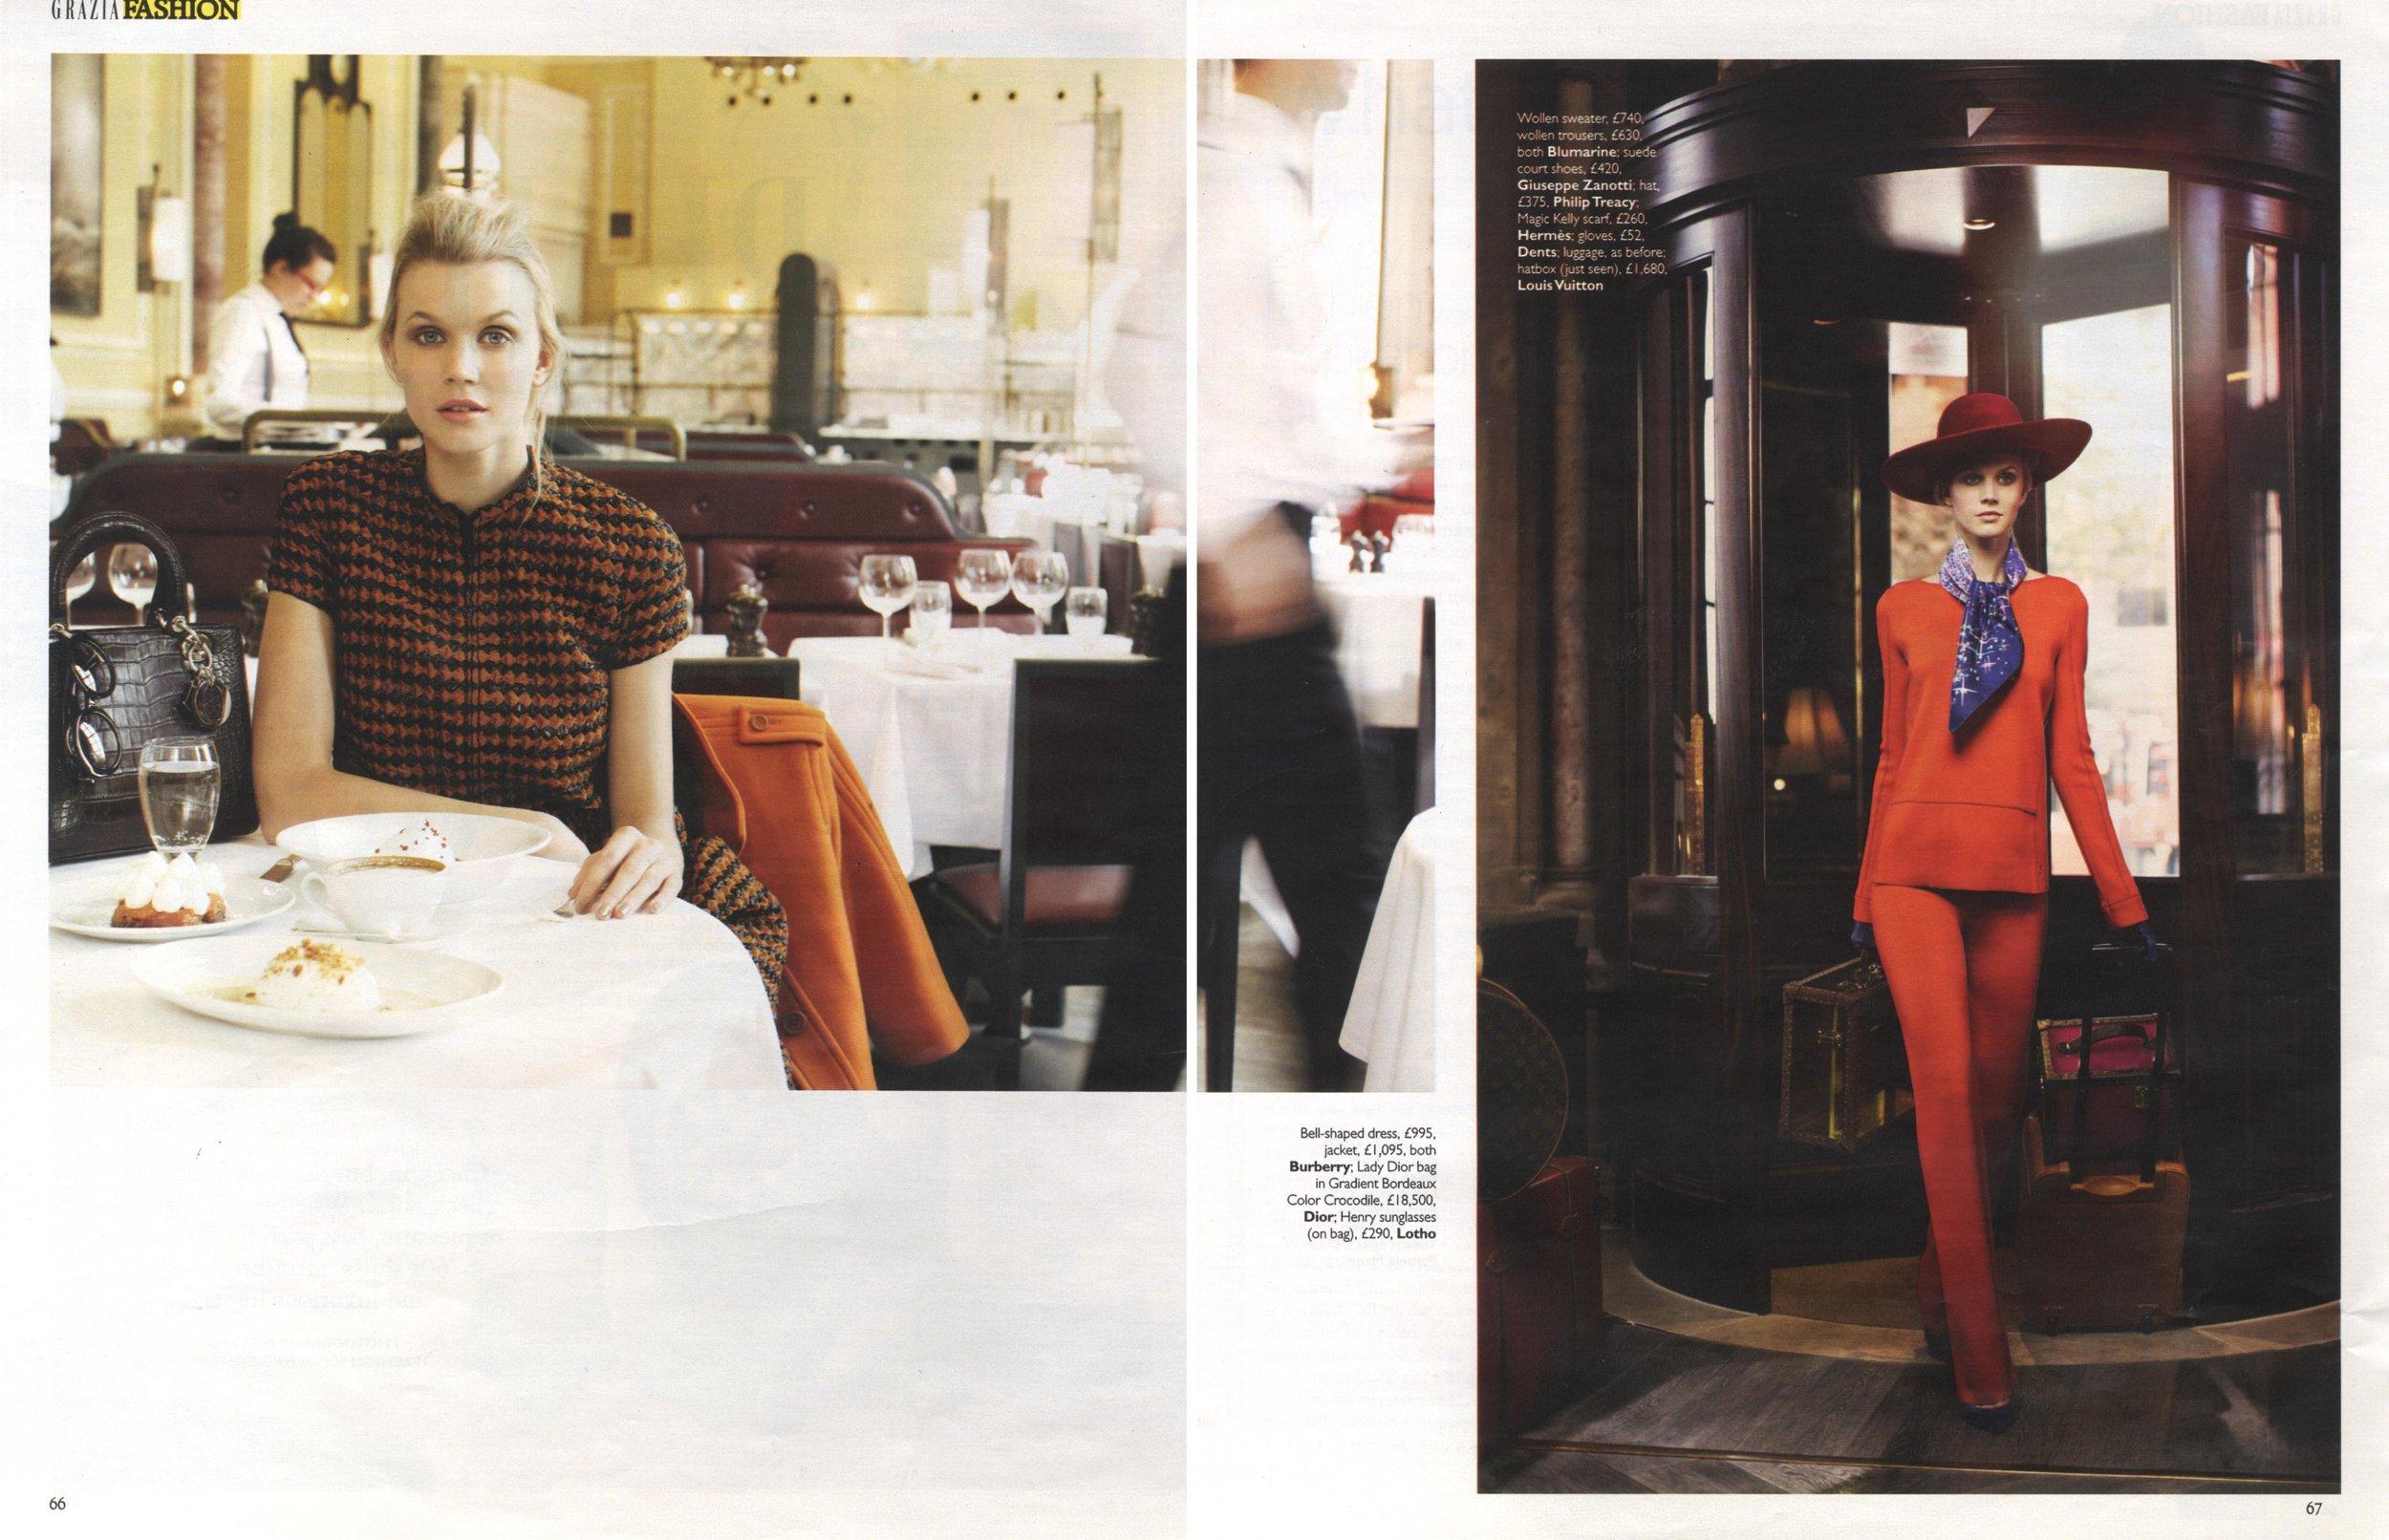 jayne moore for grazia kings cross st pancras renovation london  travel in style bold orange suit